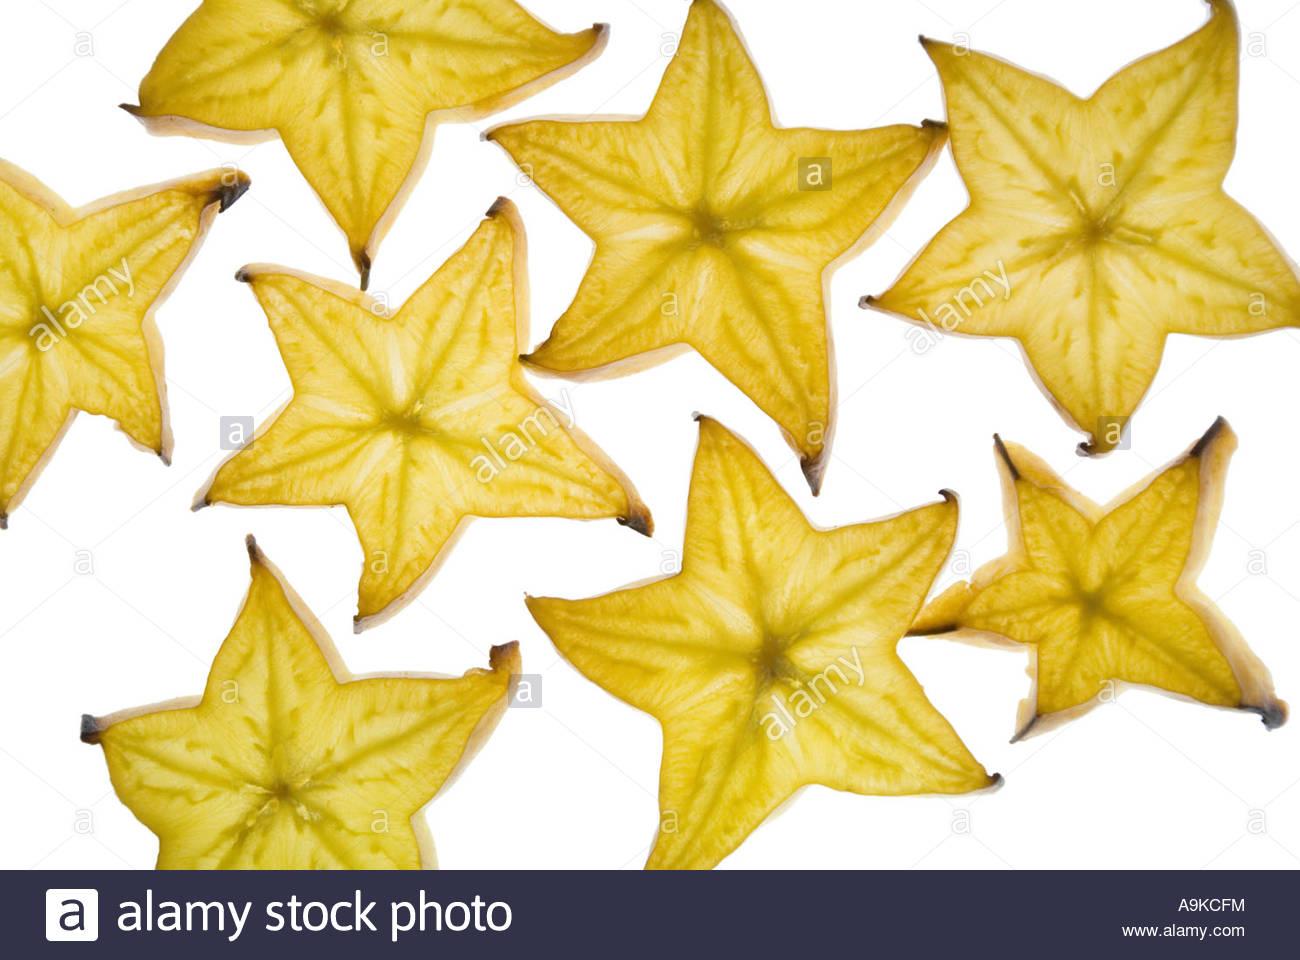 Starfruit, Carambola Fruit, Bilimbi, Belimbing, Chinese Star Fruit.